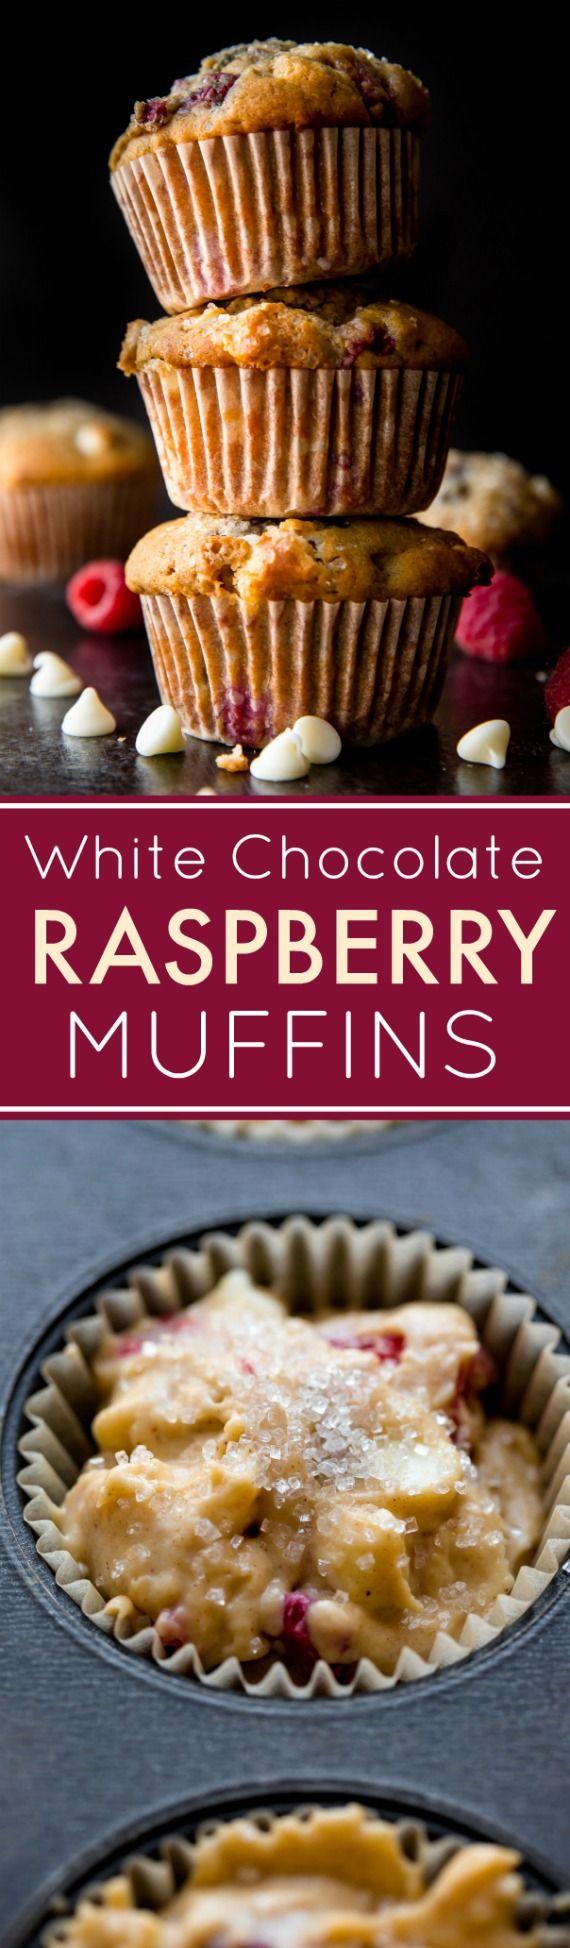 Delicious white chocolate raspberry muffins with big raspberries in every single bite! Recipe on sallysbakingaddiction.com